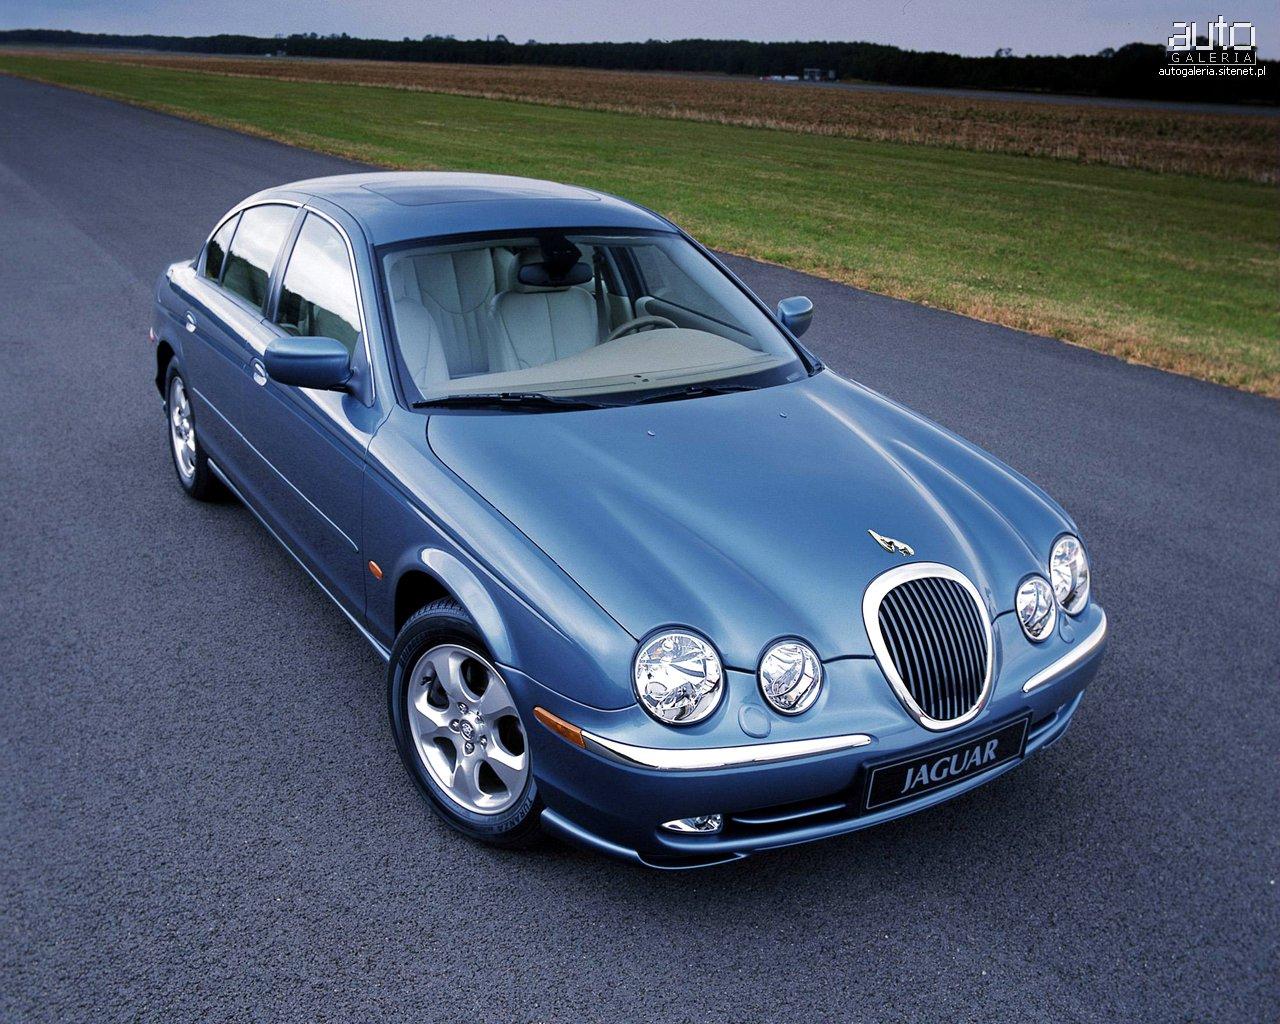 Jaguar S Type Wallpup Com